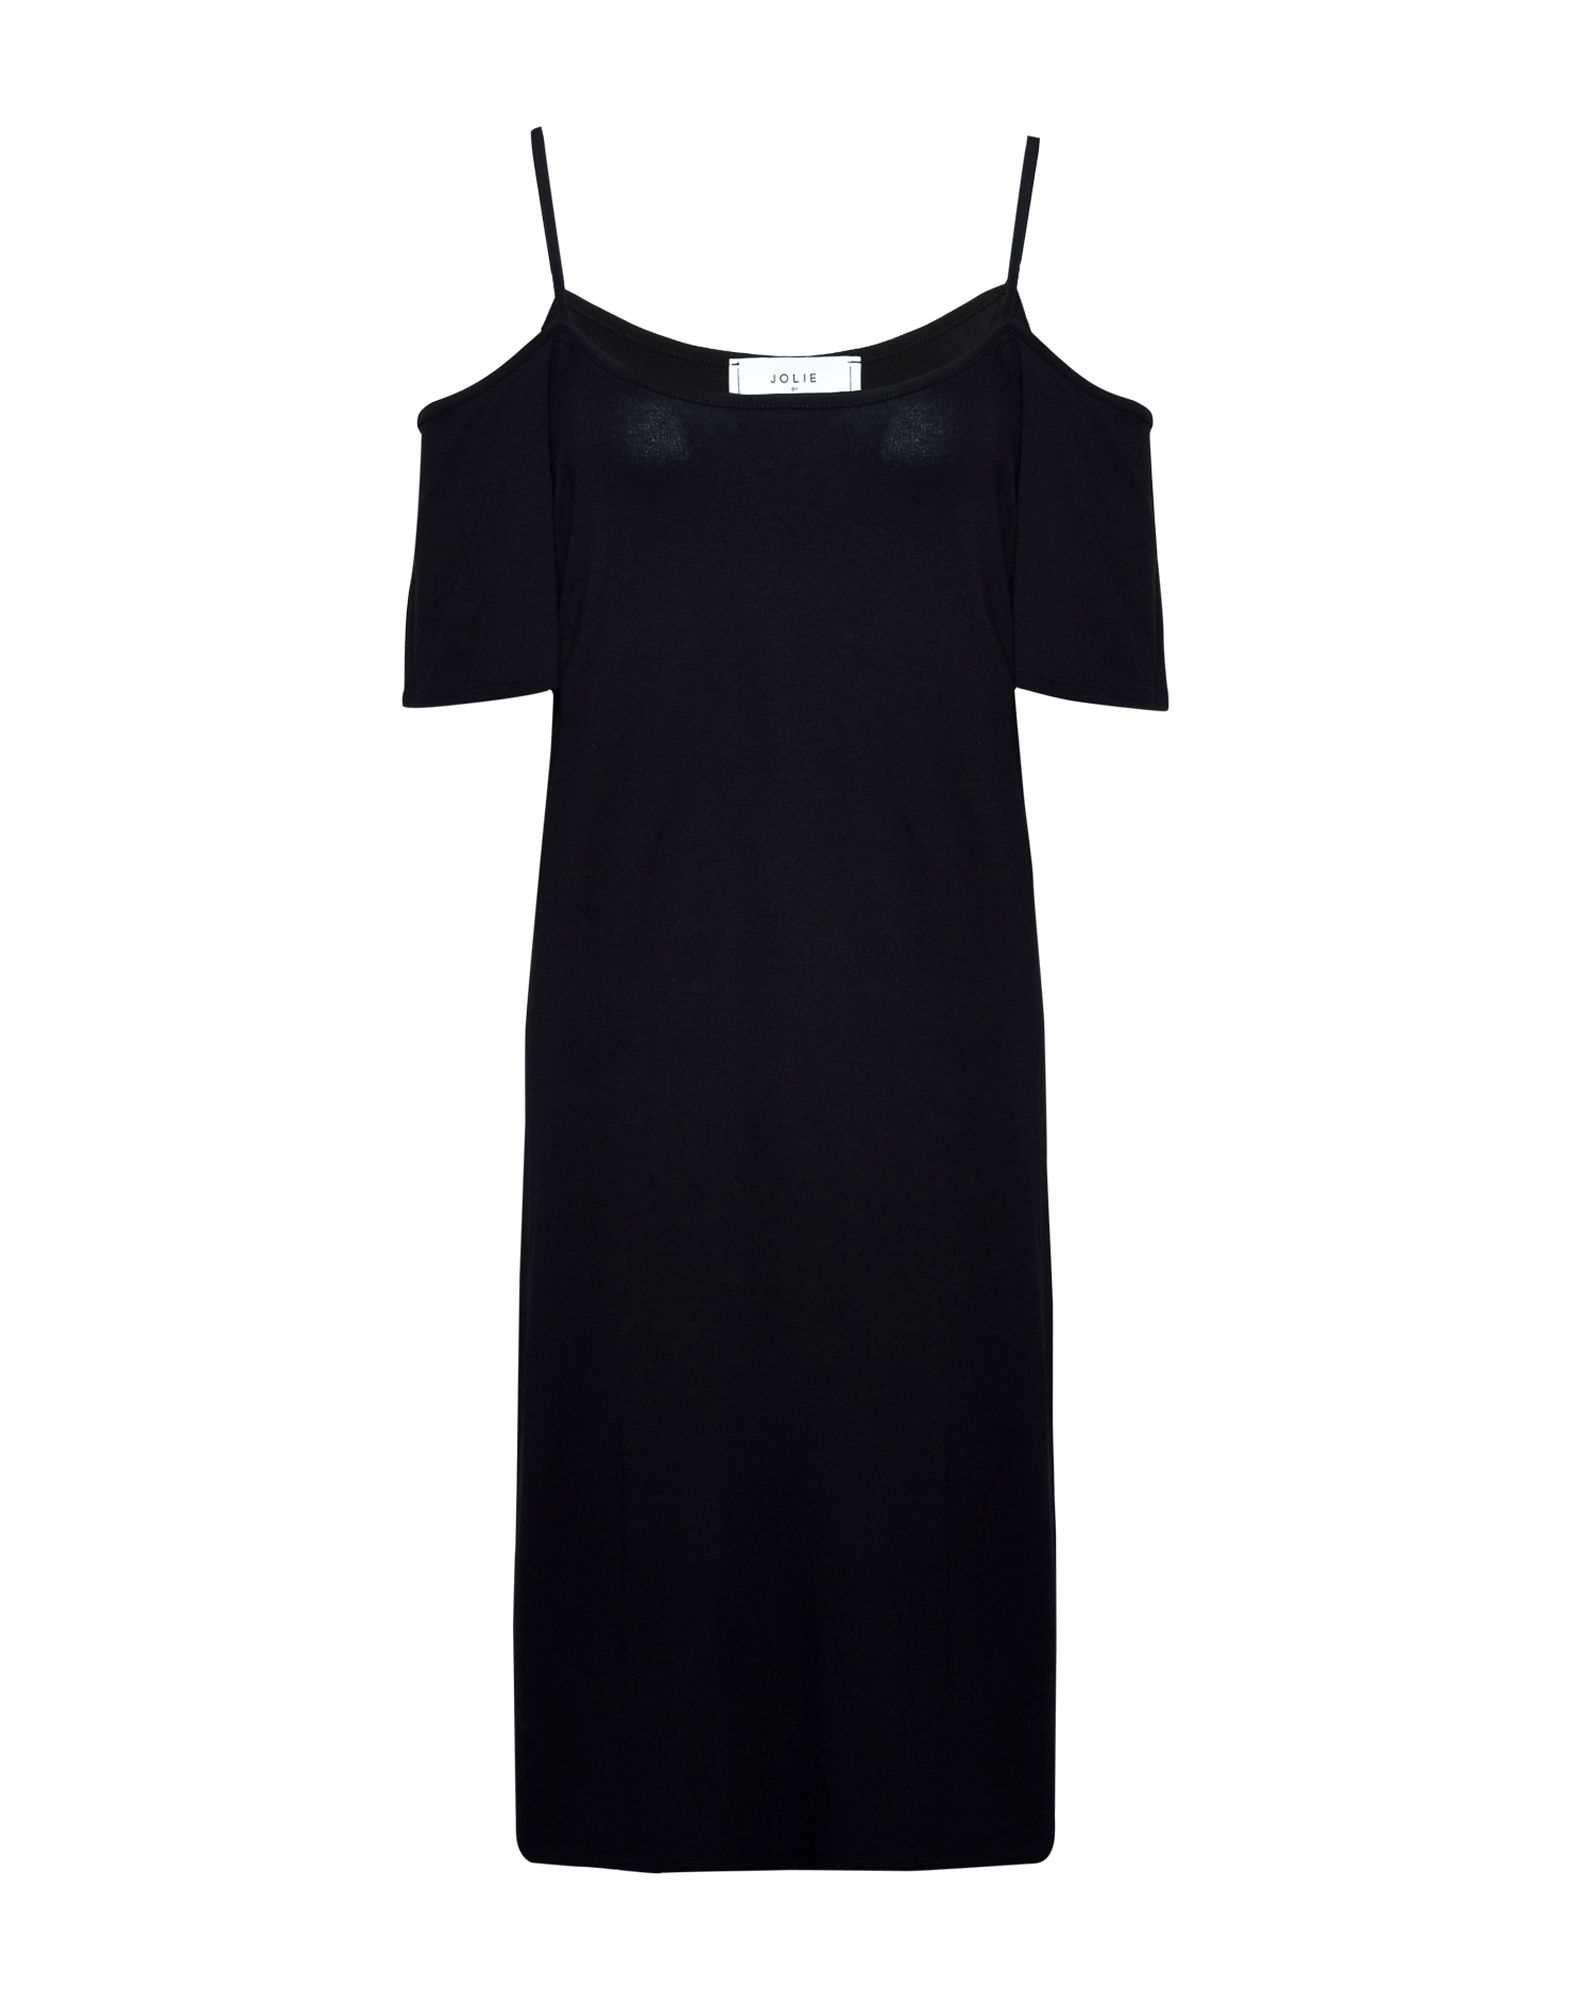 JOLIE by EDWARD SPIERS Damen Kurzes Kleid Farbe Schwarz Größe 4